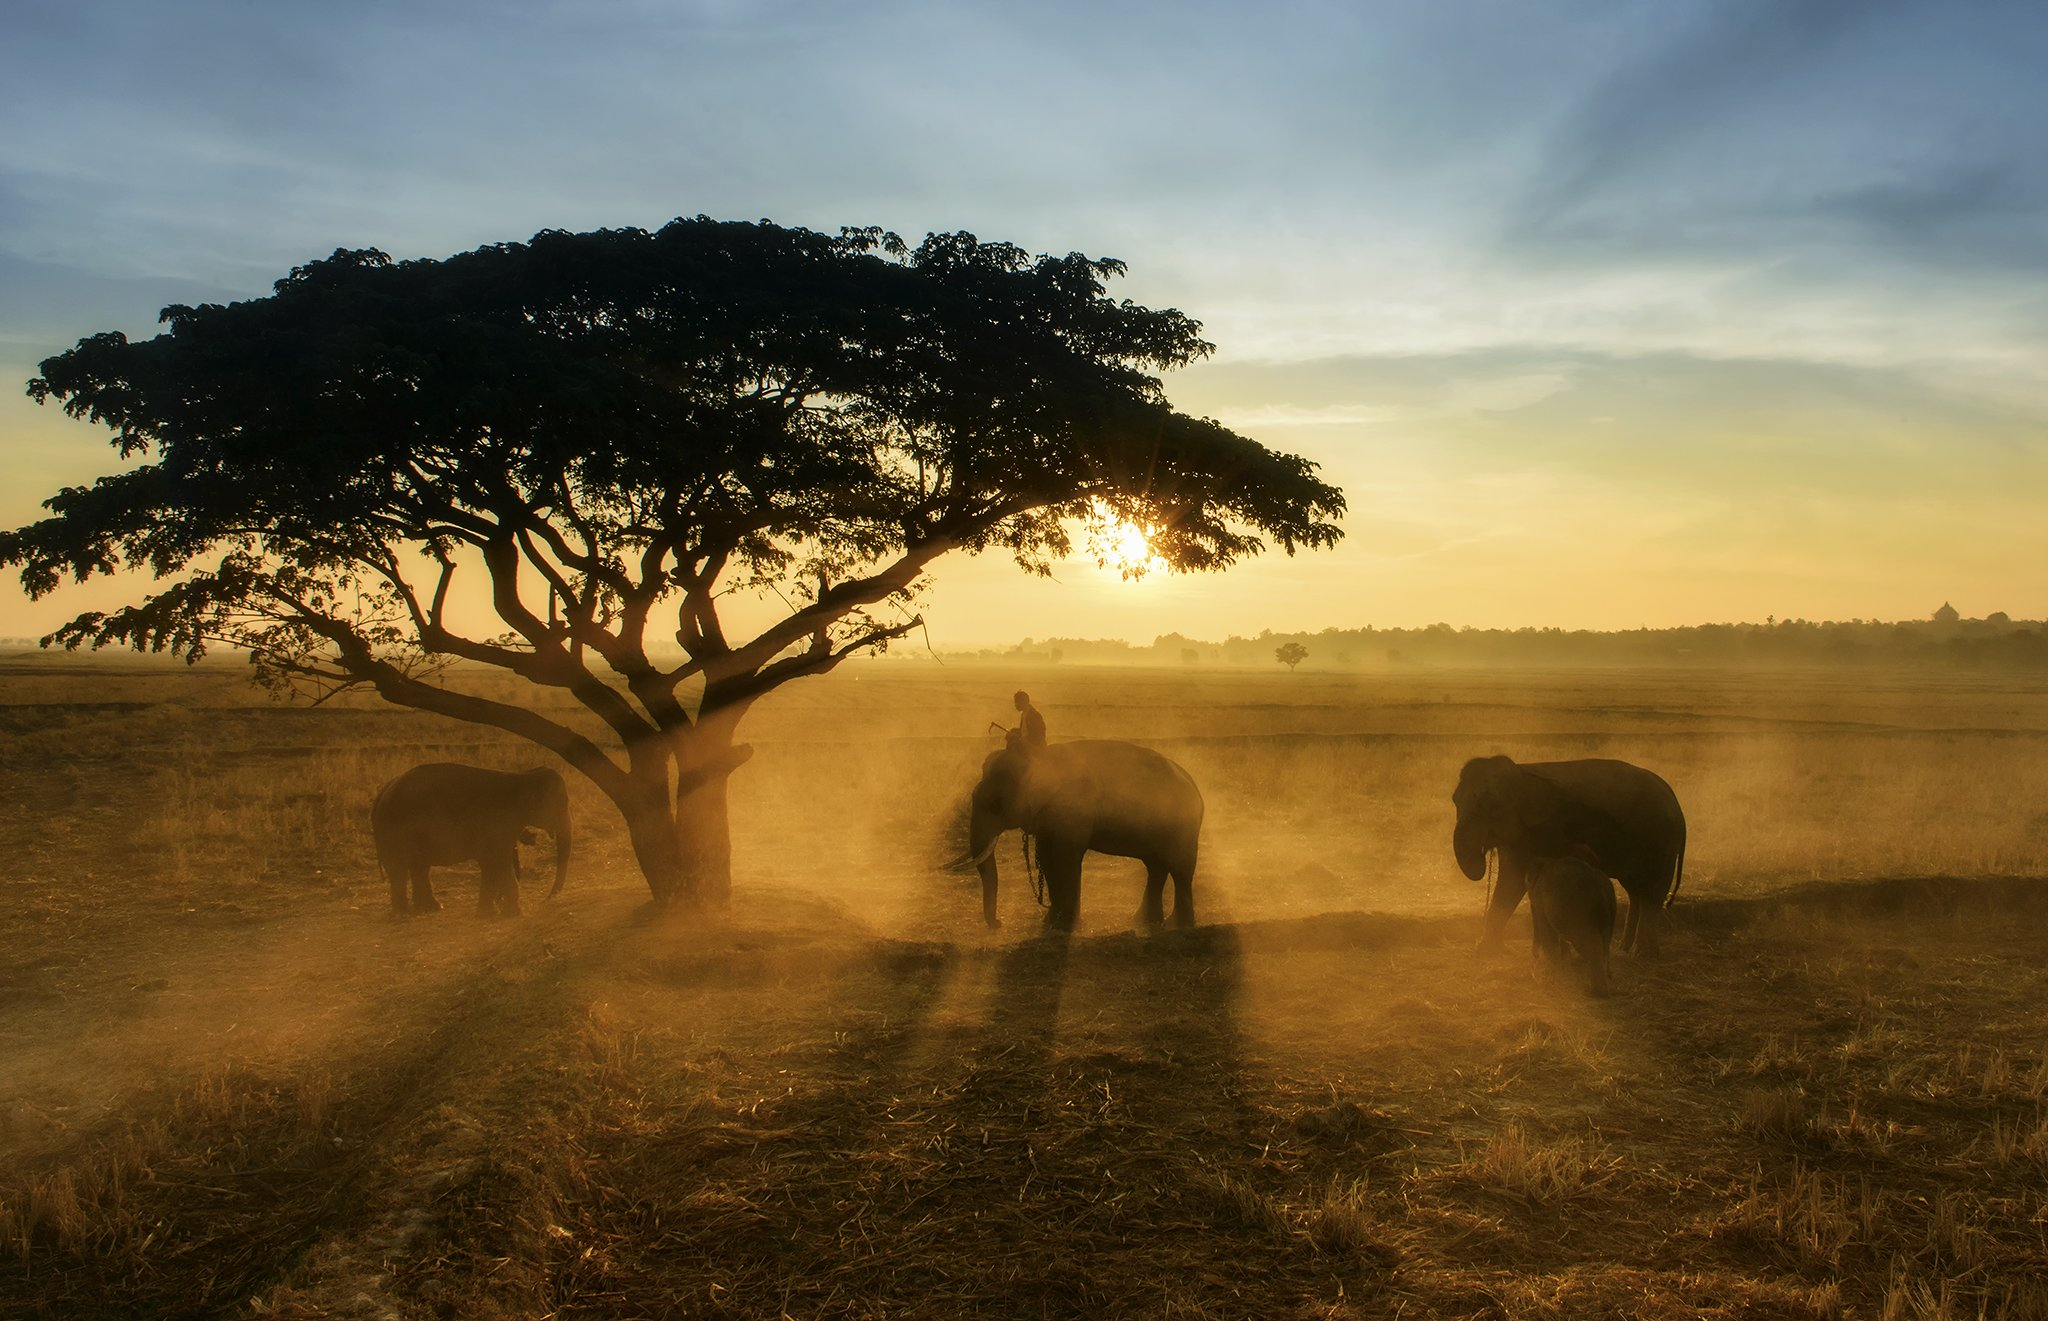 Animals, Asia, Asian, Elephant, Life, Sun, Sunlight, Sunrise, Sunset, Thai, Thailand, Travel, Tree, Wildlife, Saravut Whanset